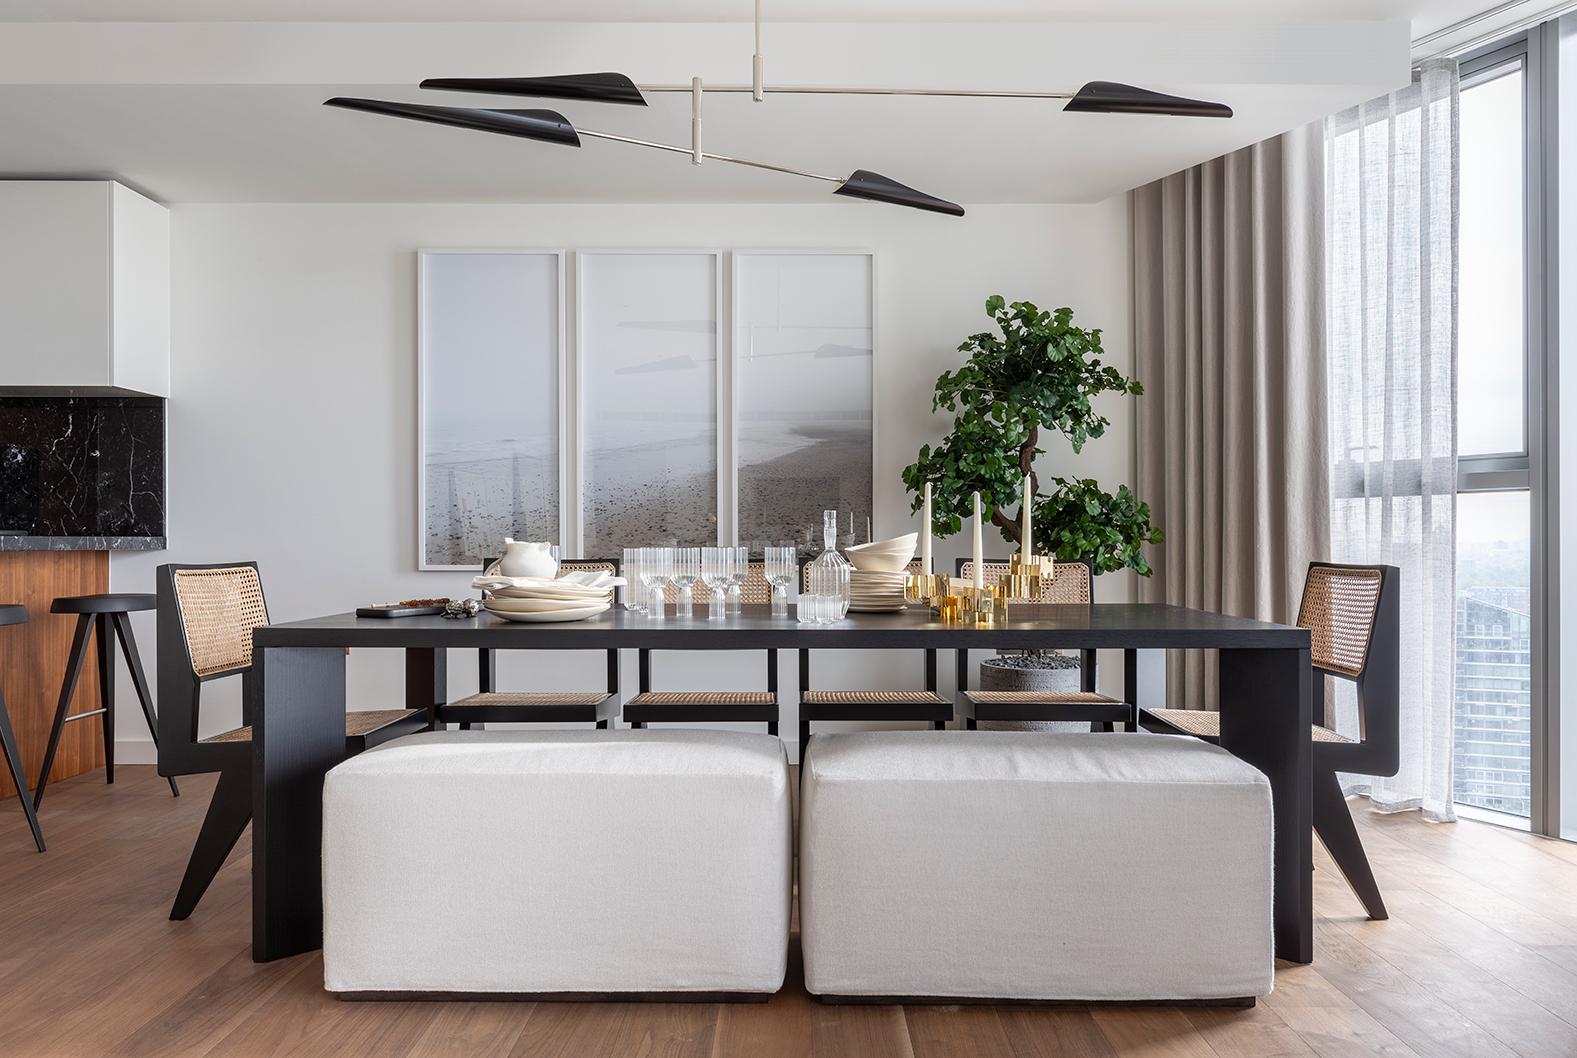 Interior Design Show Apartments for property development